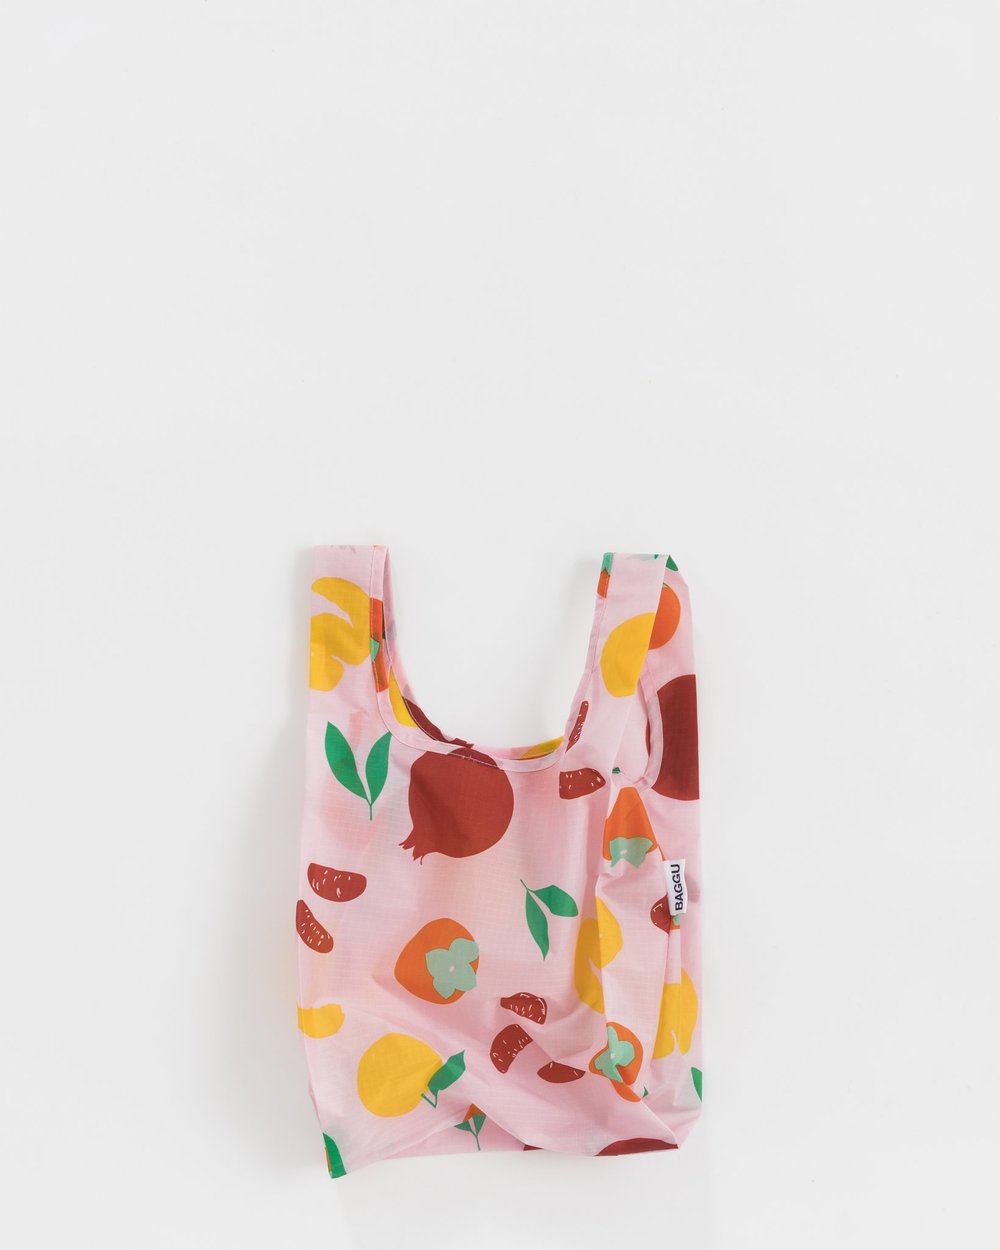 Baby_Baggu_Ripstop_Autumn_Fruit-01_2048x2048.jpg